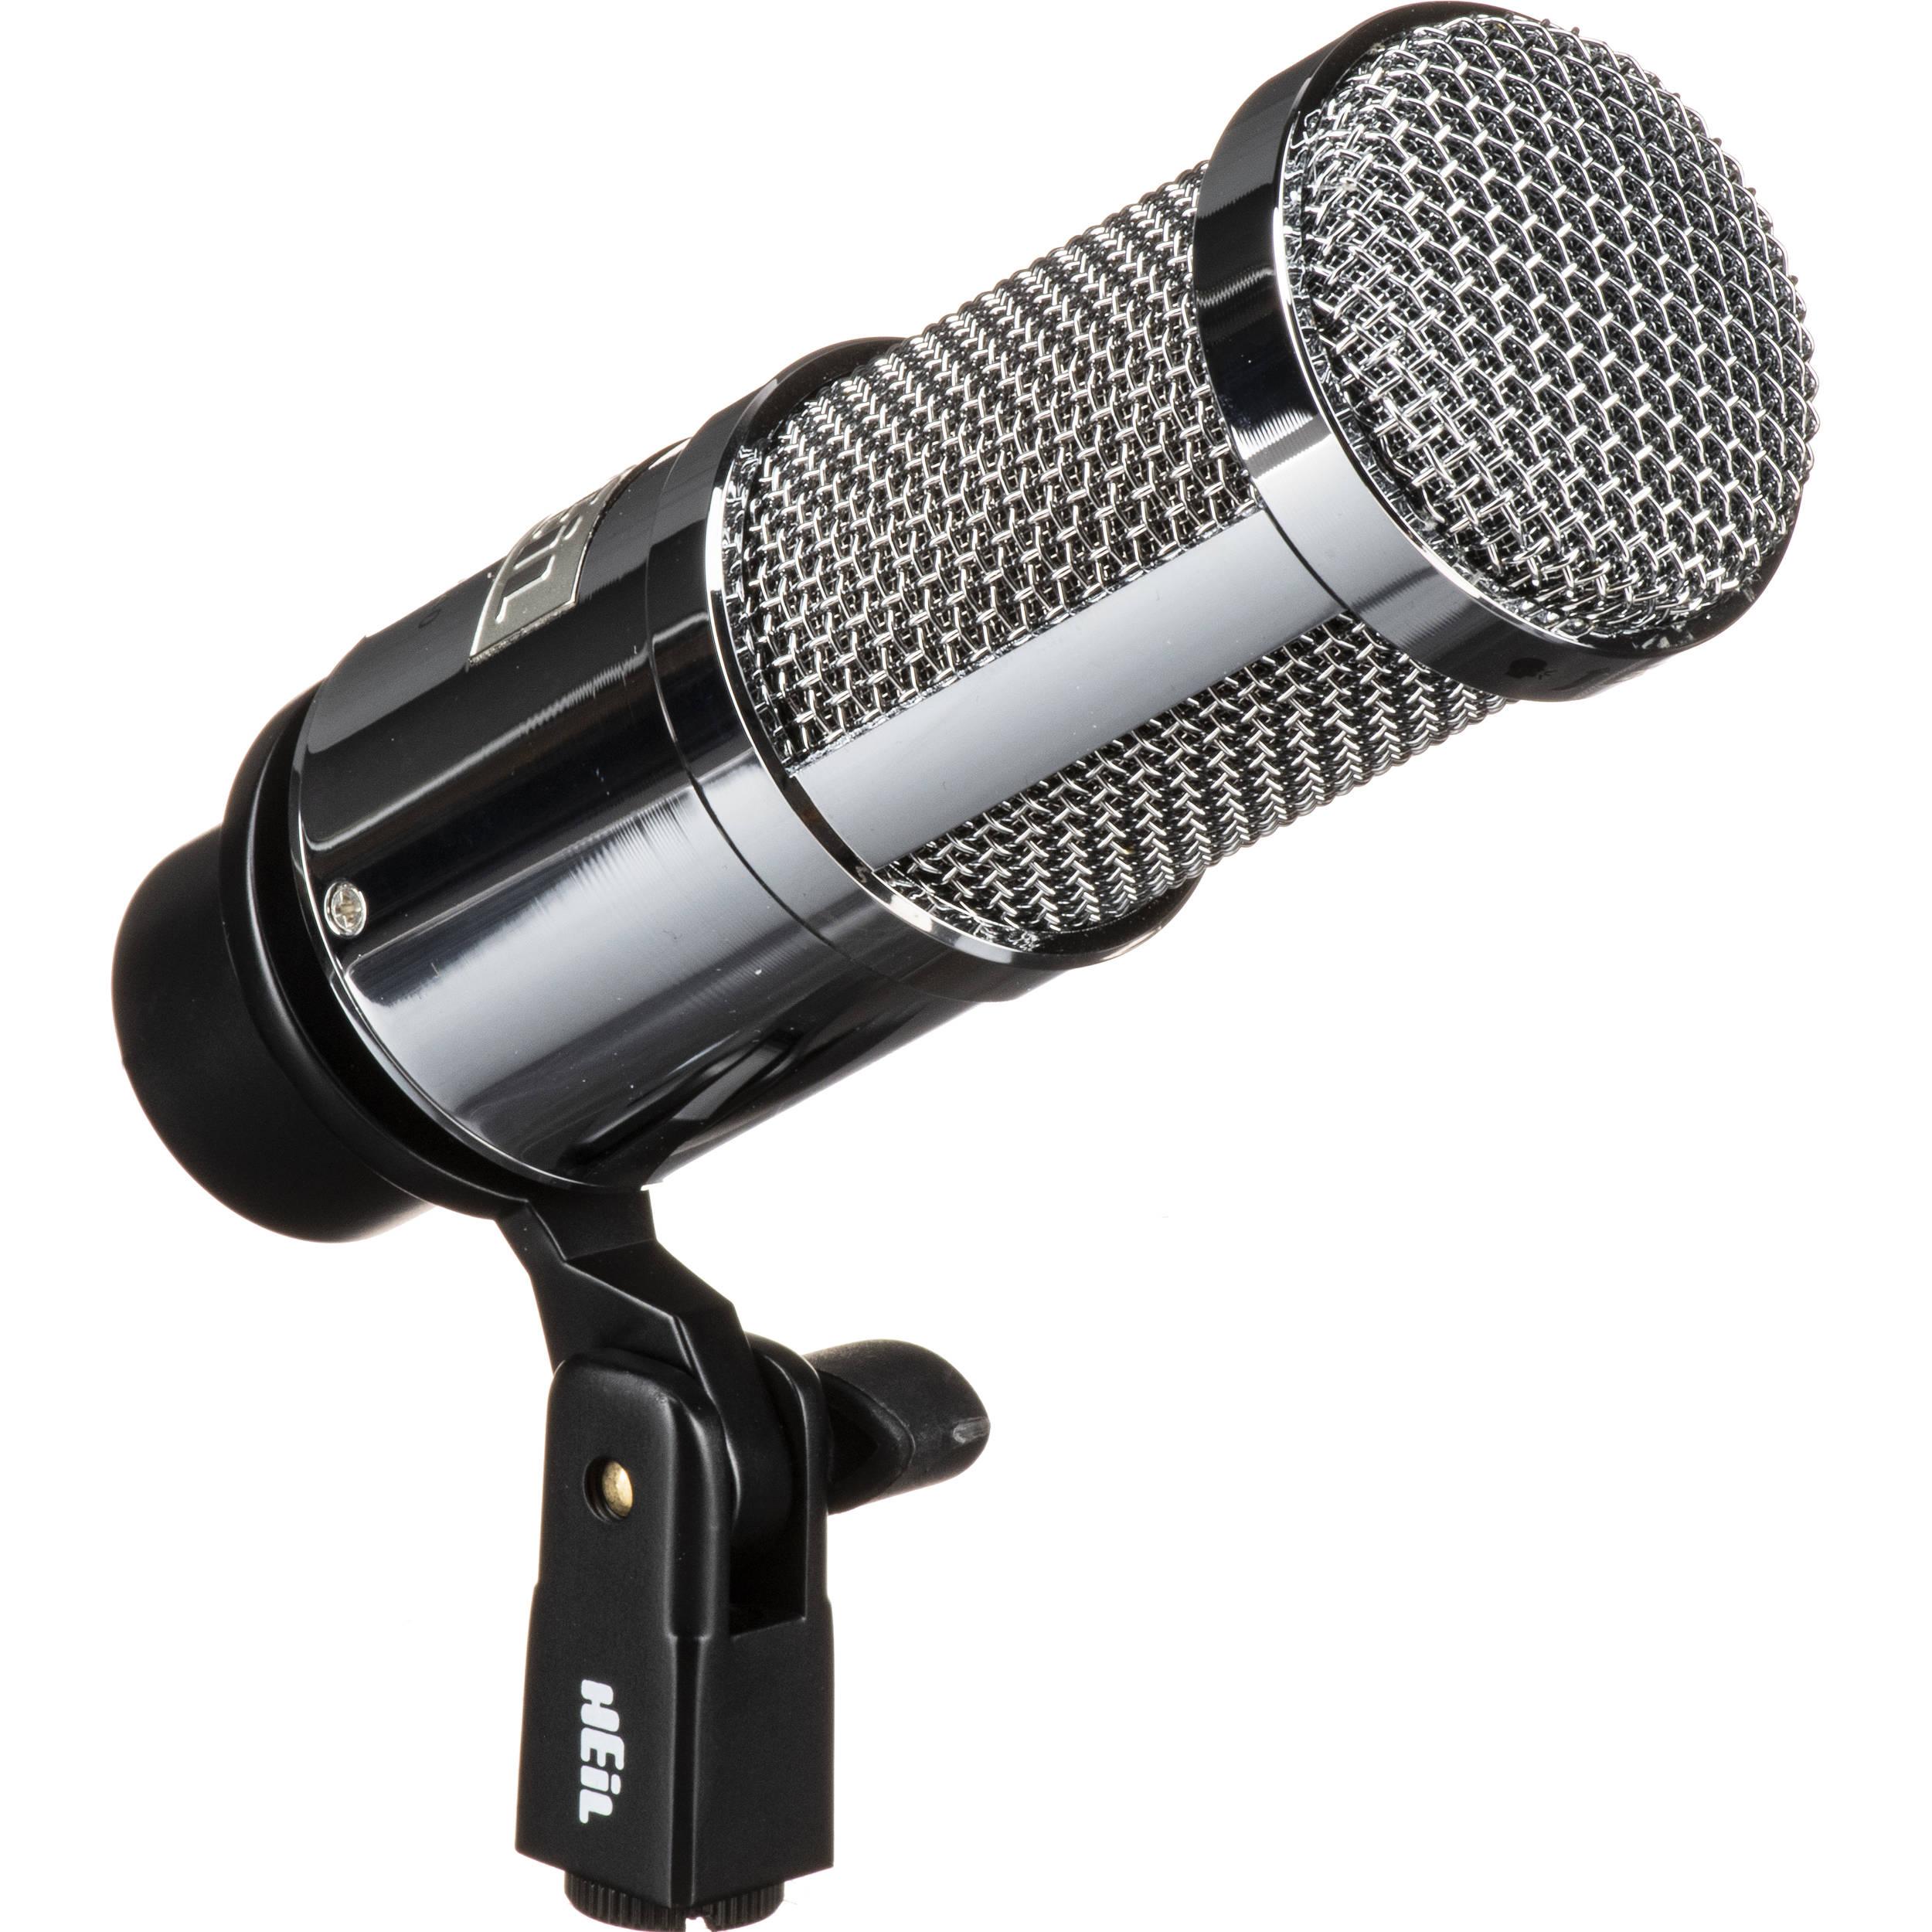 heil sound pr 40 dynamic cardioid studio microphone pr40chrome. Black Bedroom Furniture Sets. Home Design Ideas